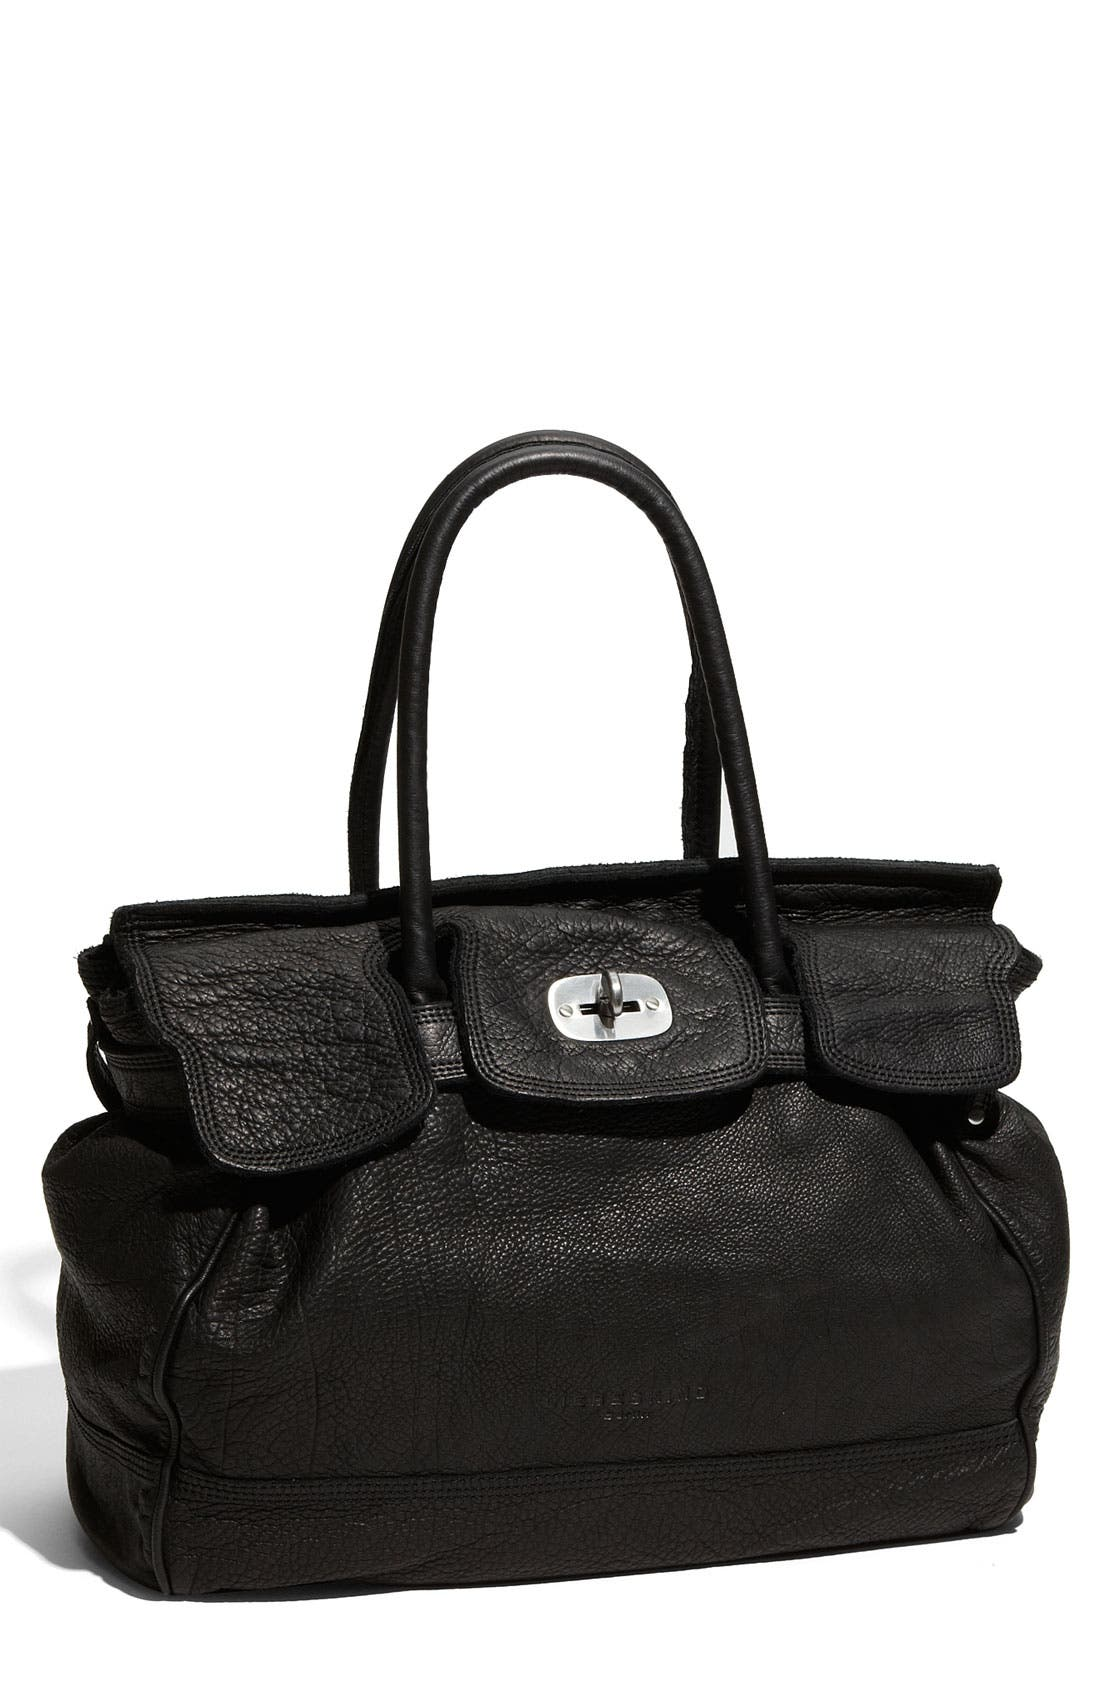 LIEBESKIND 'Mia - Large' Soft Leather Satchel, Main, color, 001